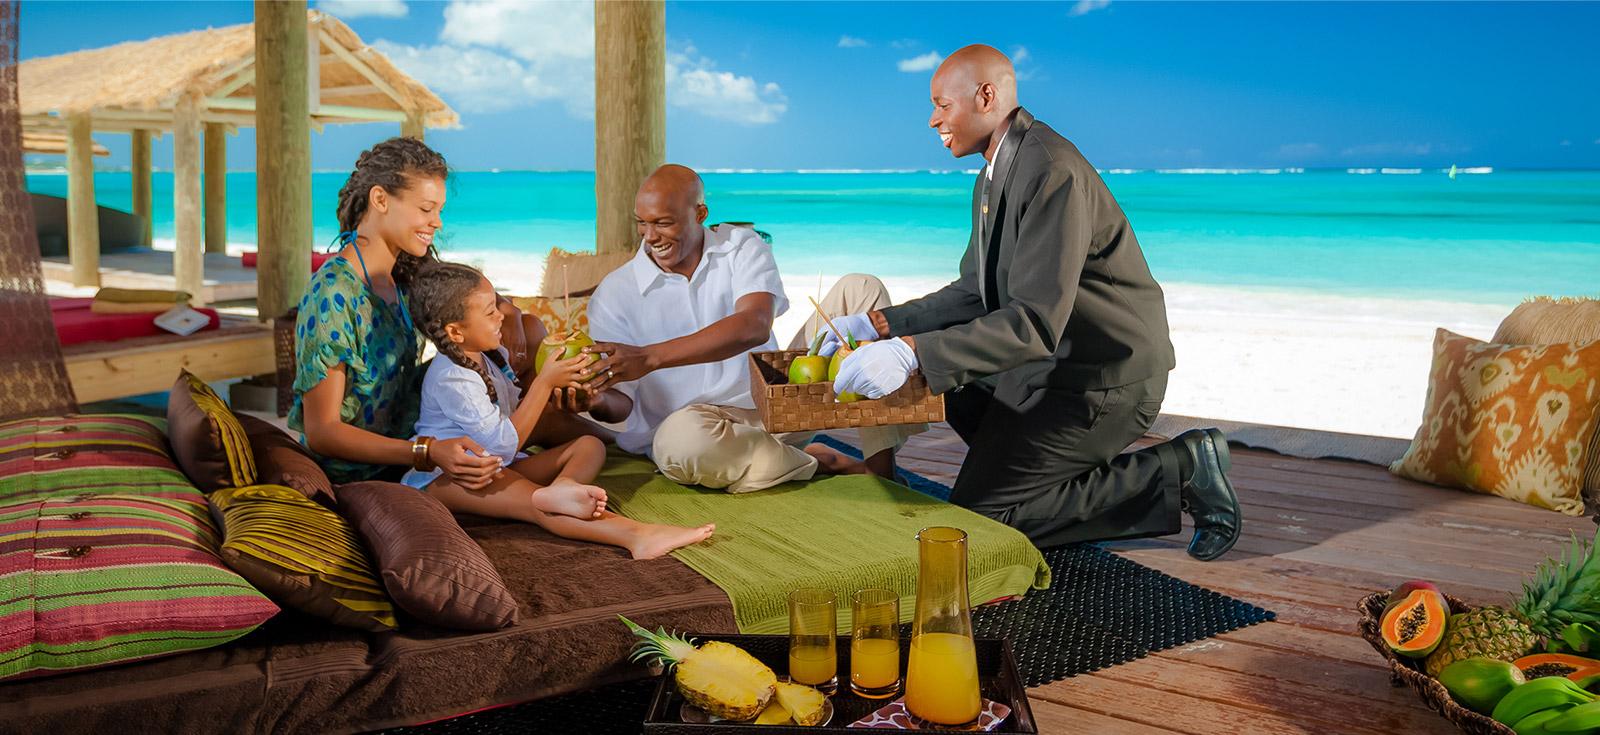 Escort service vacations